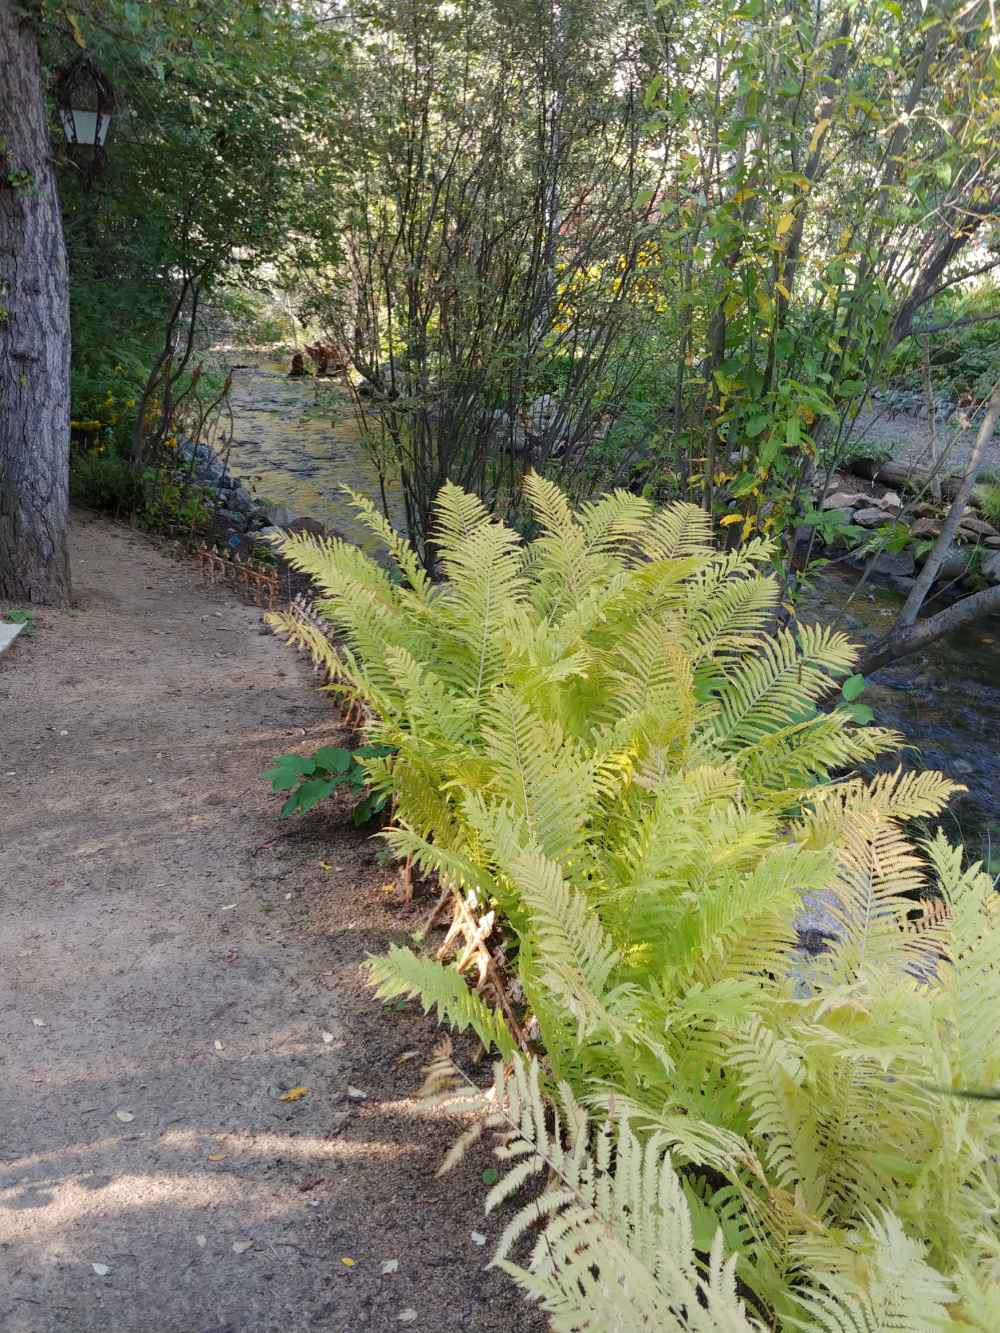 Ferns growing around Prickly Pear Creek.